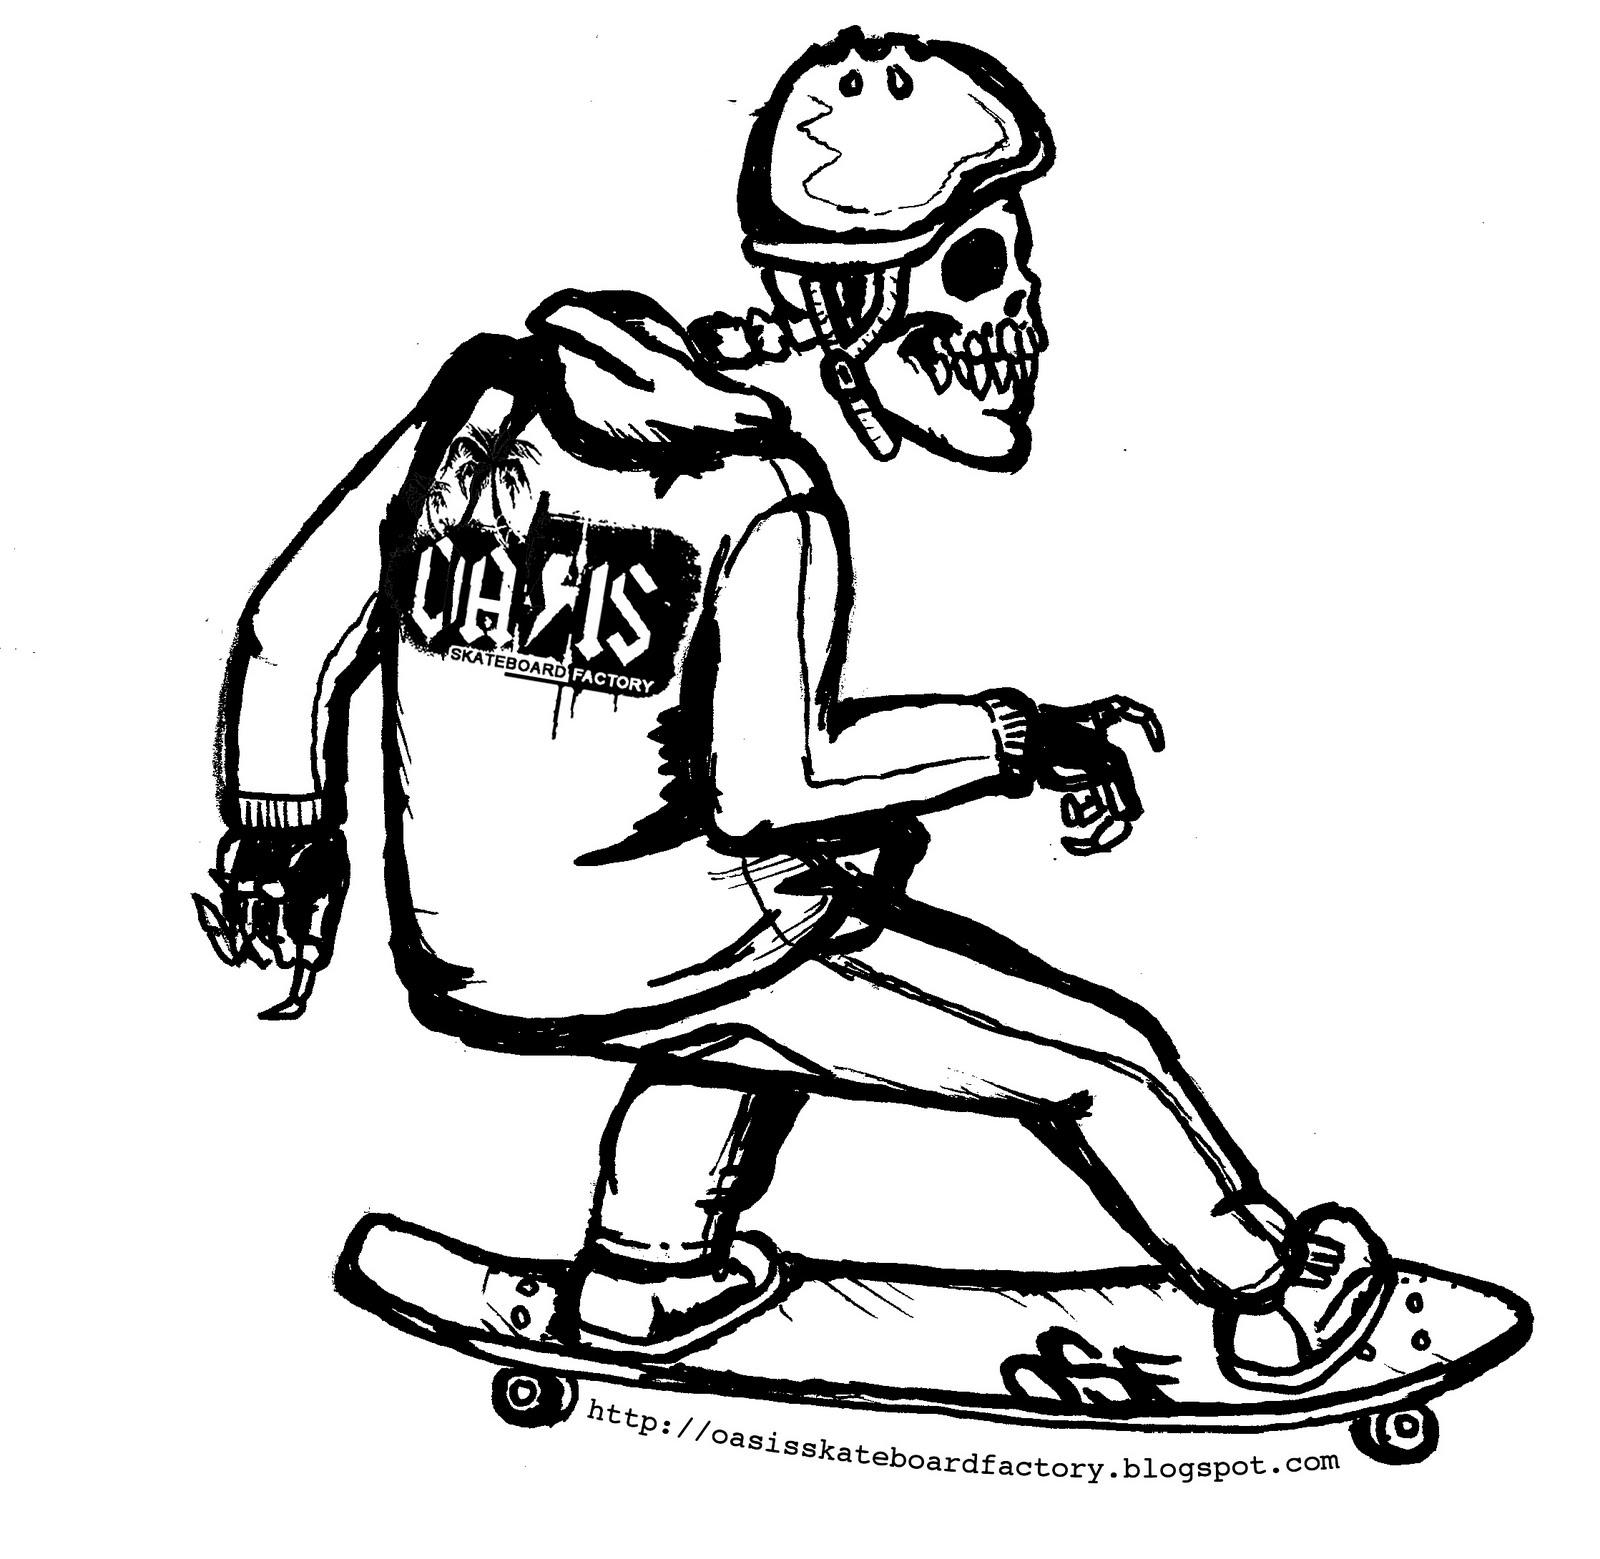 1600x1559 Oasis Skateboard Factory June 2011